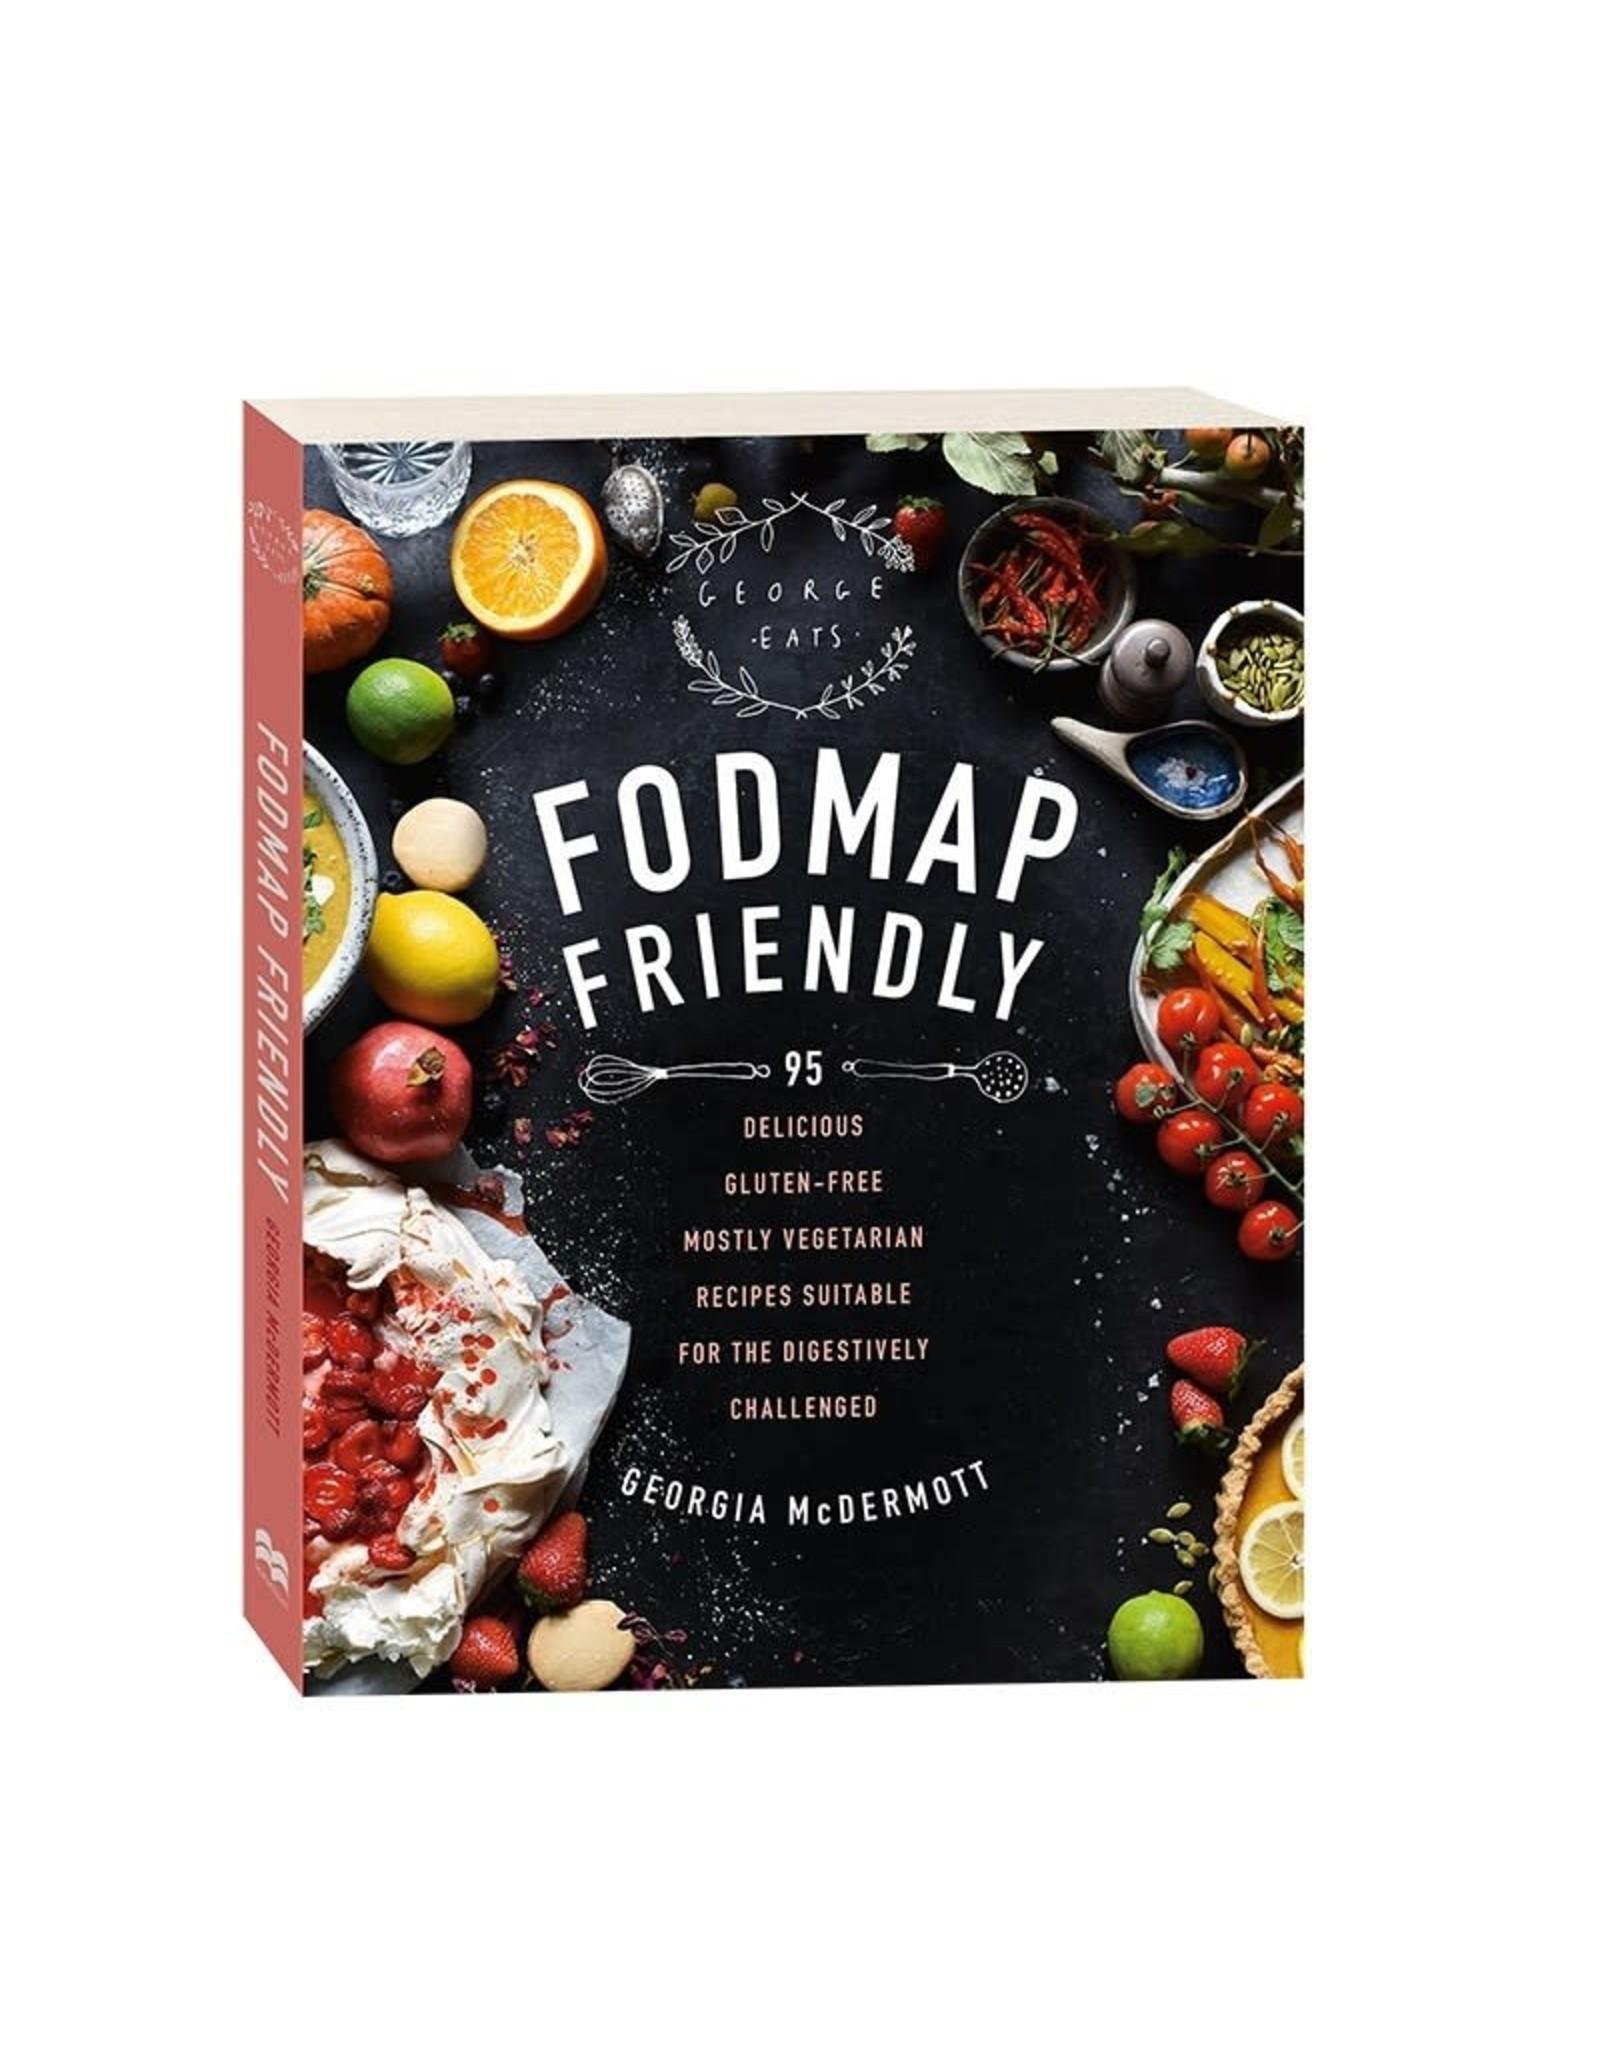 Fodmap Friendy by Georgia McDermott